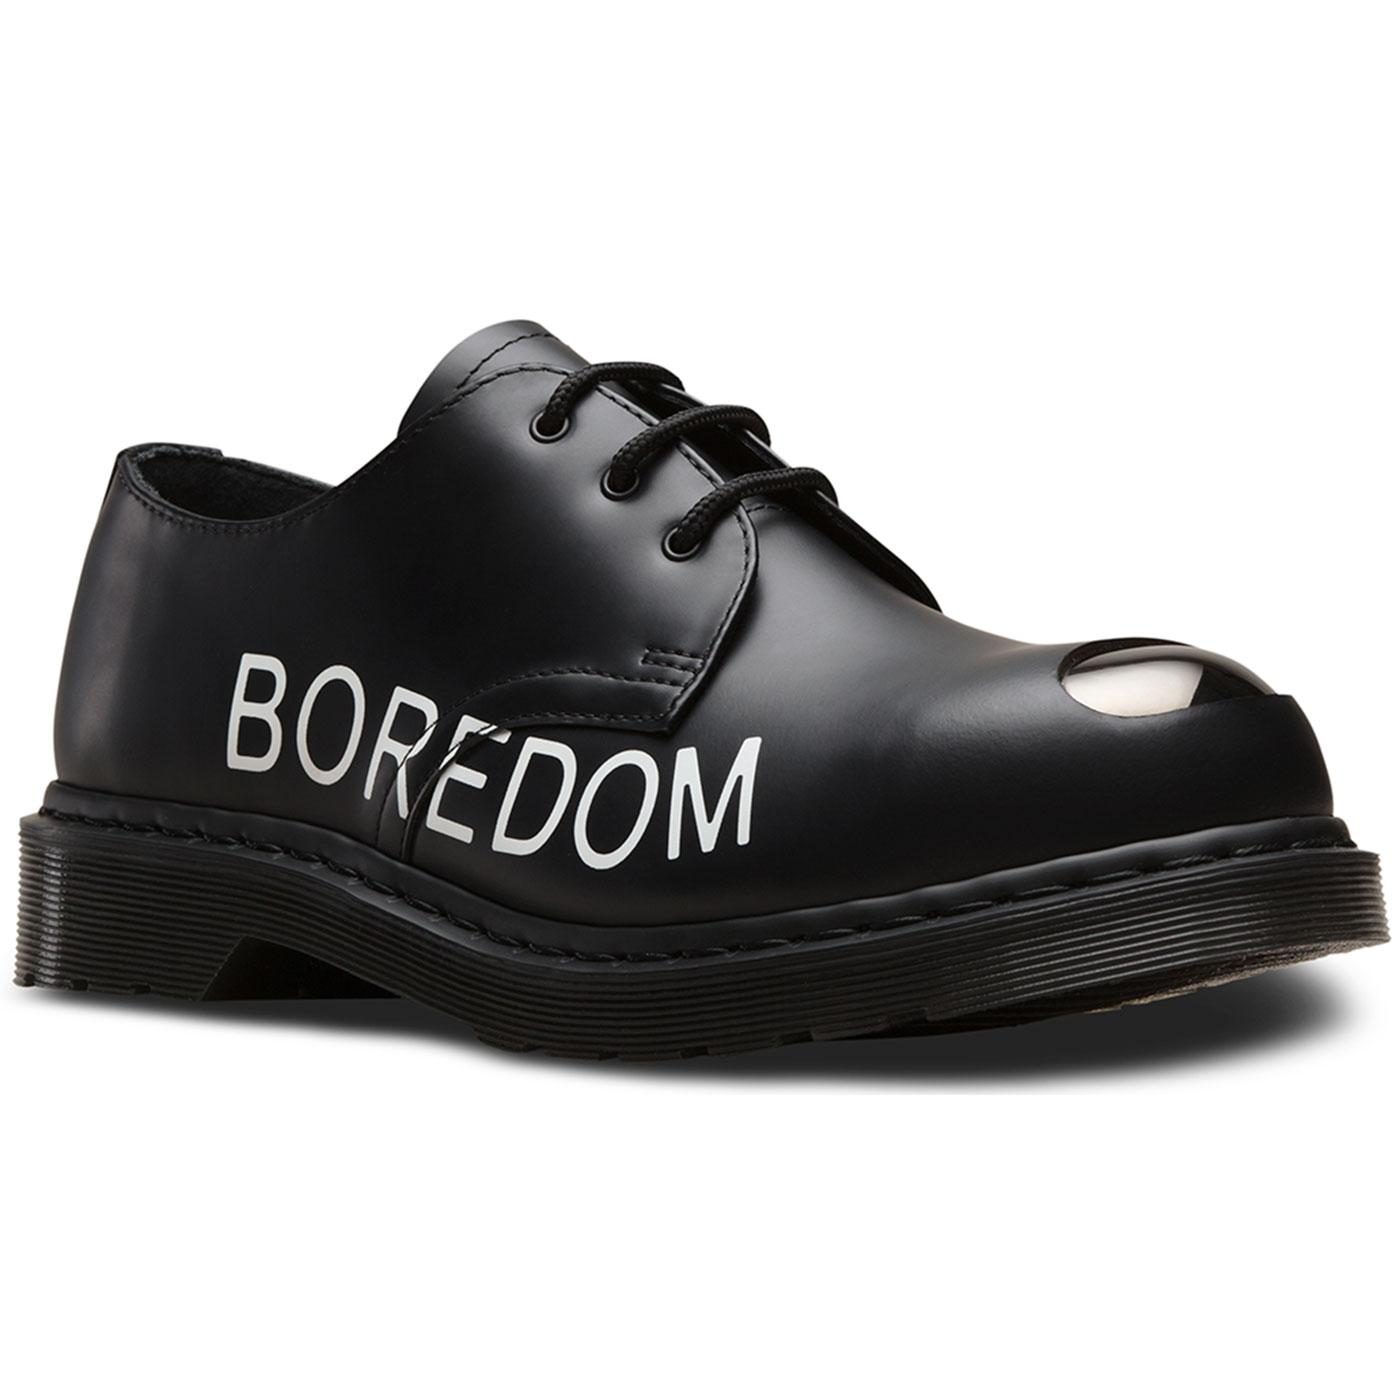 DR MARTENS x SEX PISTOLS 70s Pretty Vacant Shoes